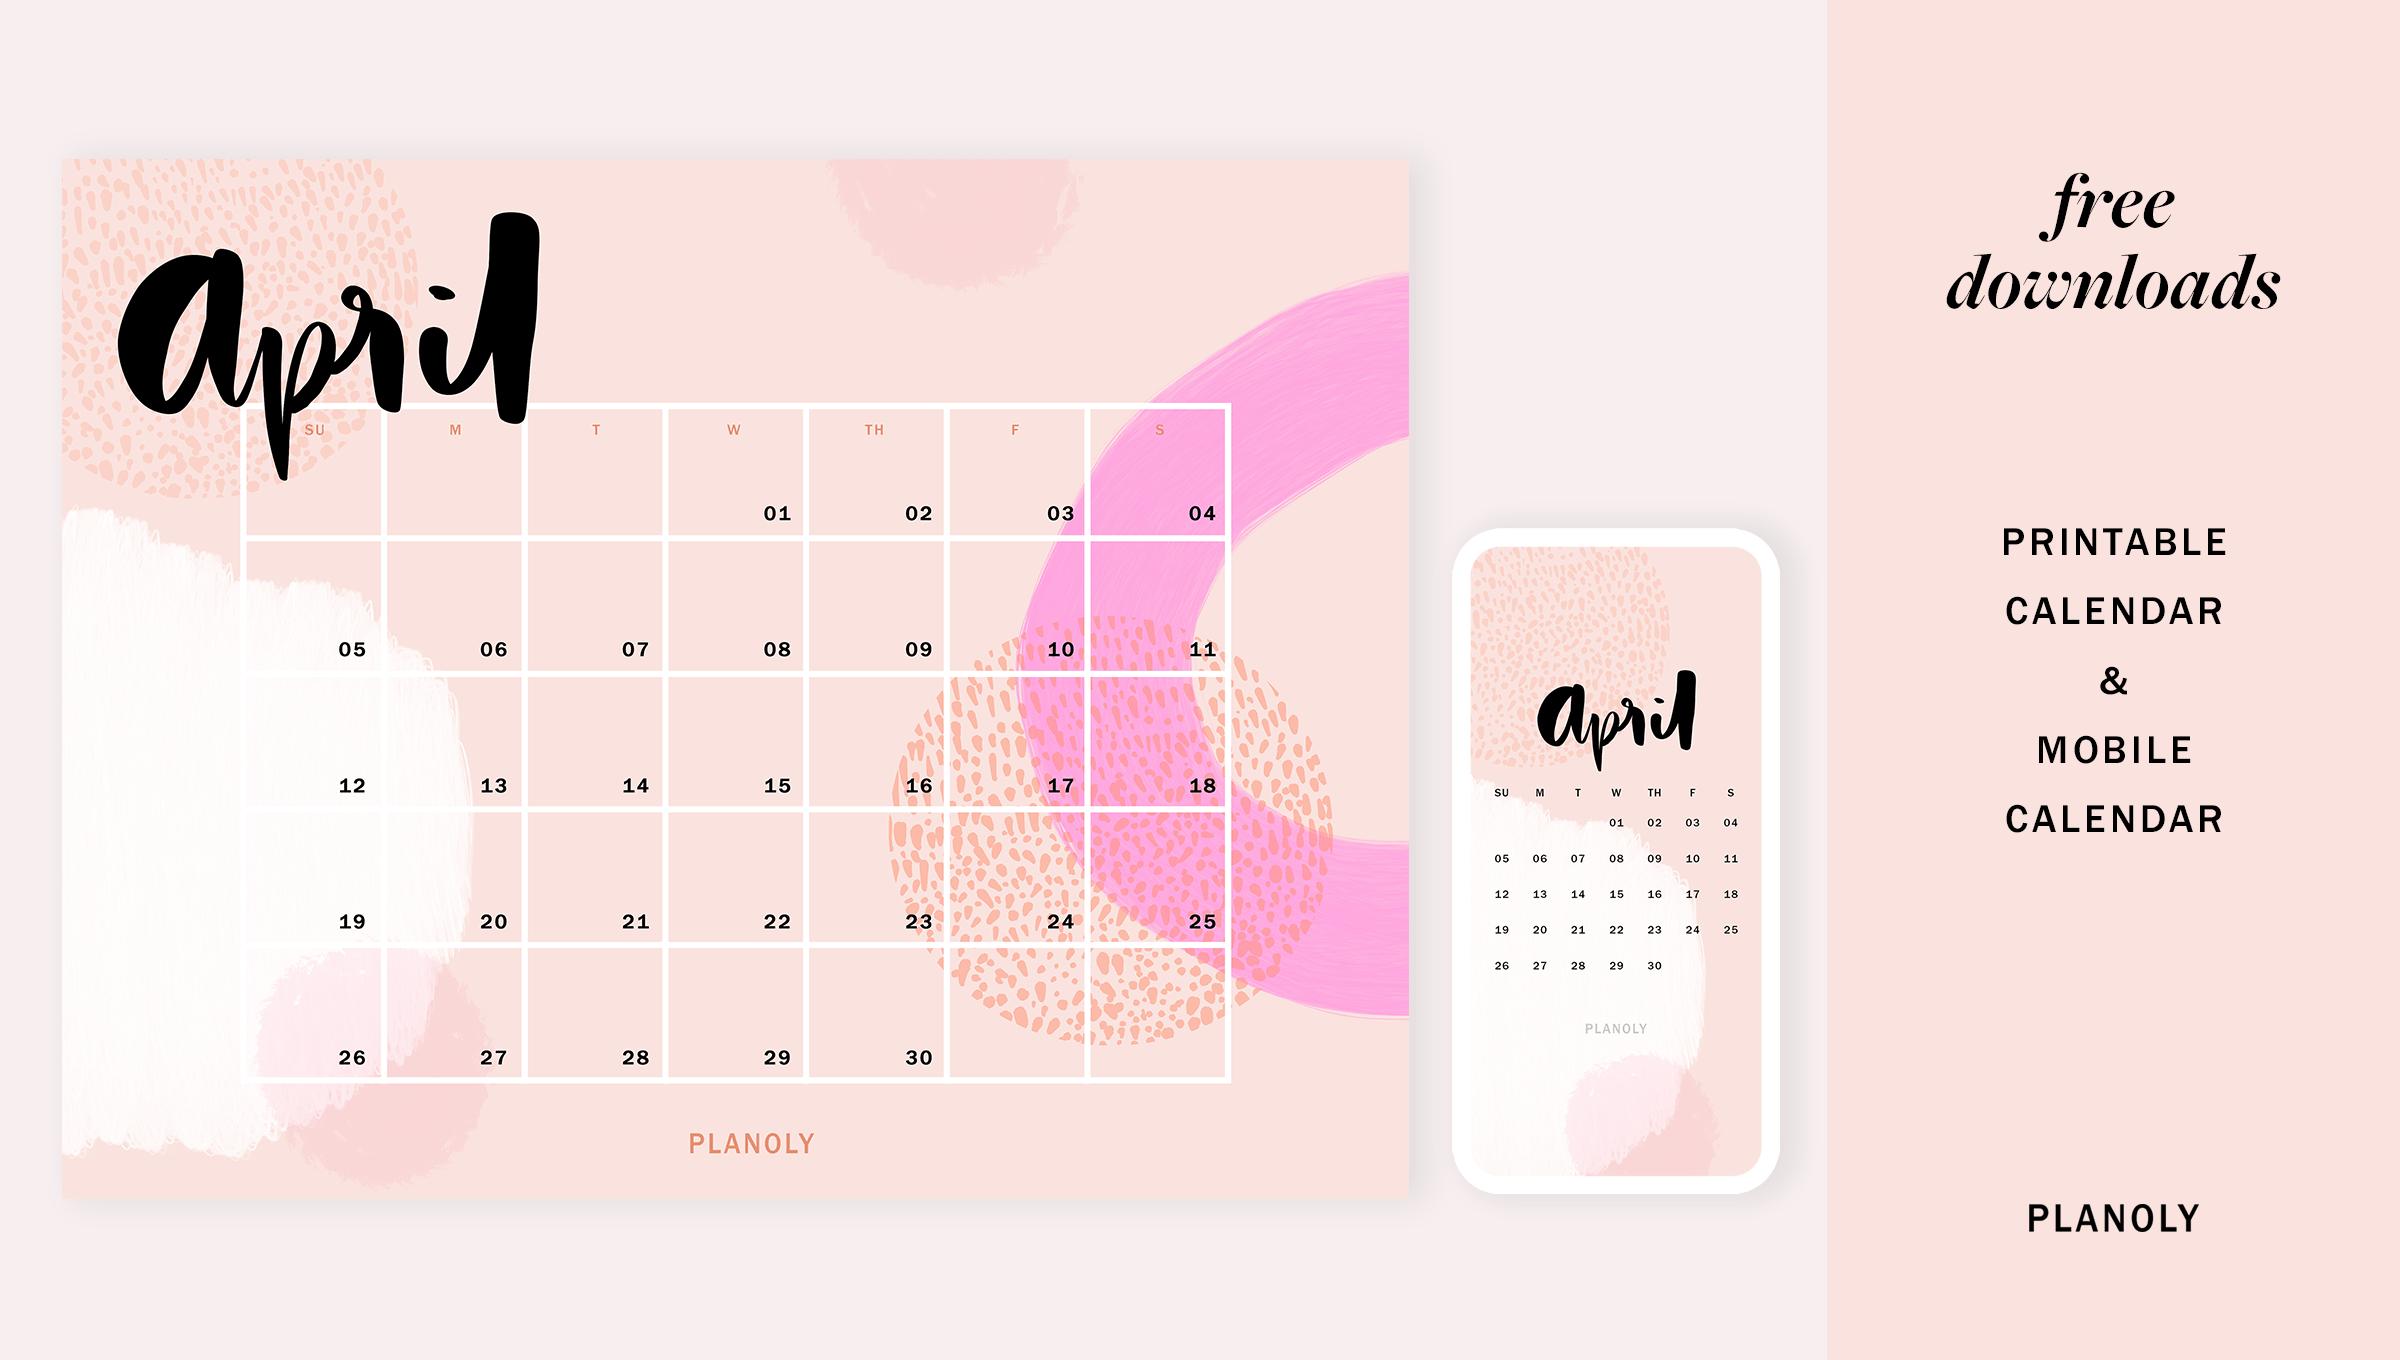 Q2 2020 Content Calendars